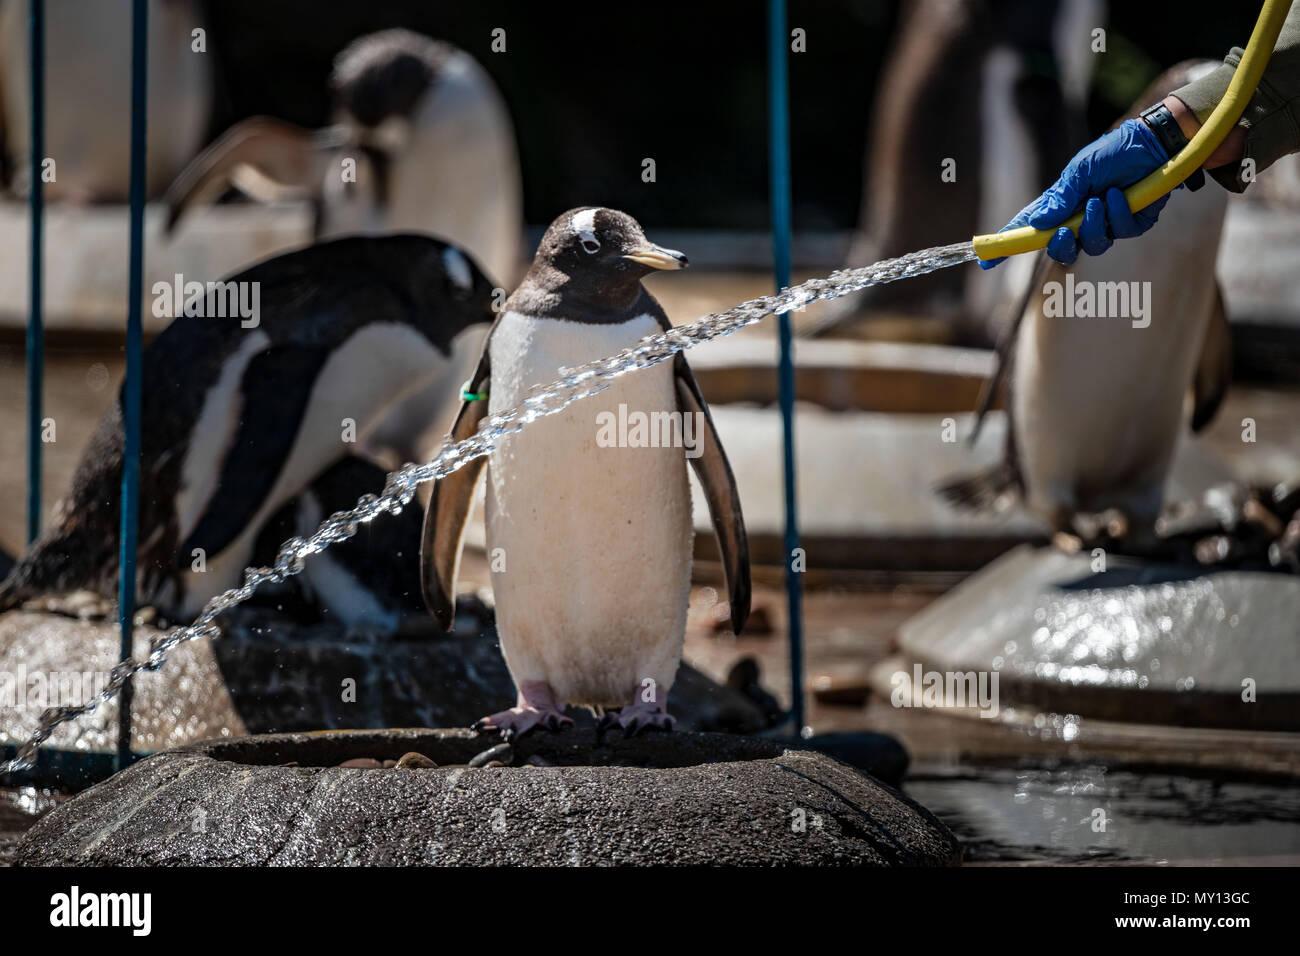 Edinburgh Zoo, UK. 5th Jun, 2018.  Gentoo Penguins at Edinburgh zoo keep cool in the hot weather. credit steven scott taylor / alamy live news - Stock Image